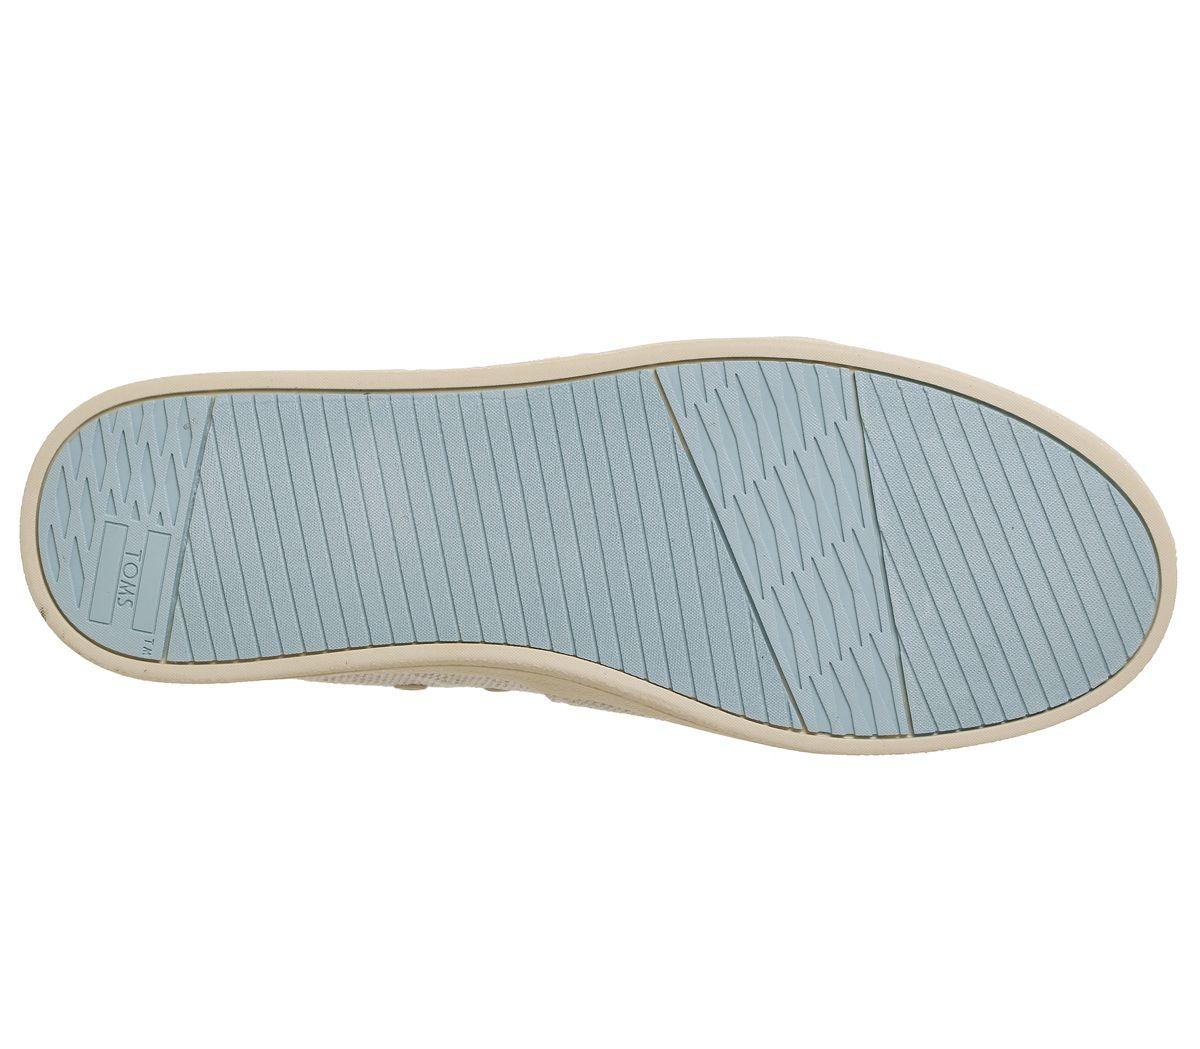 Womens-Toms-Avalon-Sneakers-Natural-Yarn-Dye-Flats thumbnail 8